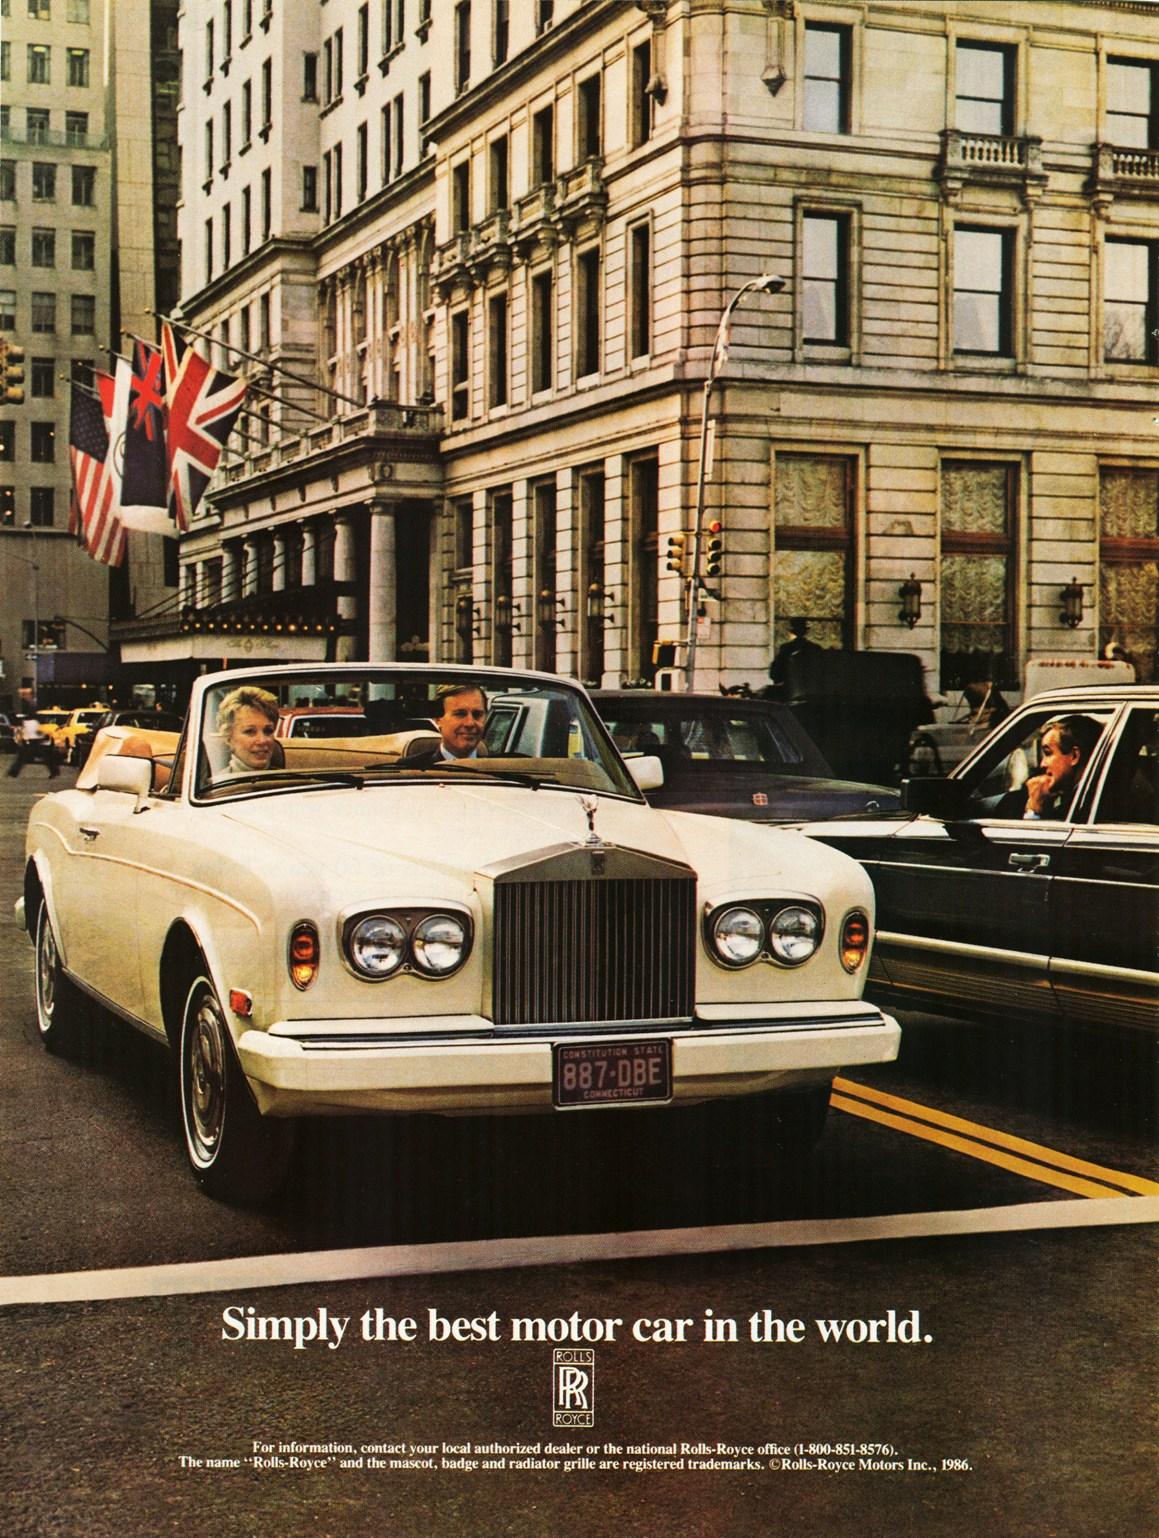 1986-Rolls-Royce-Corniche.jpg